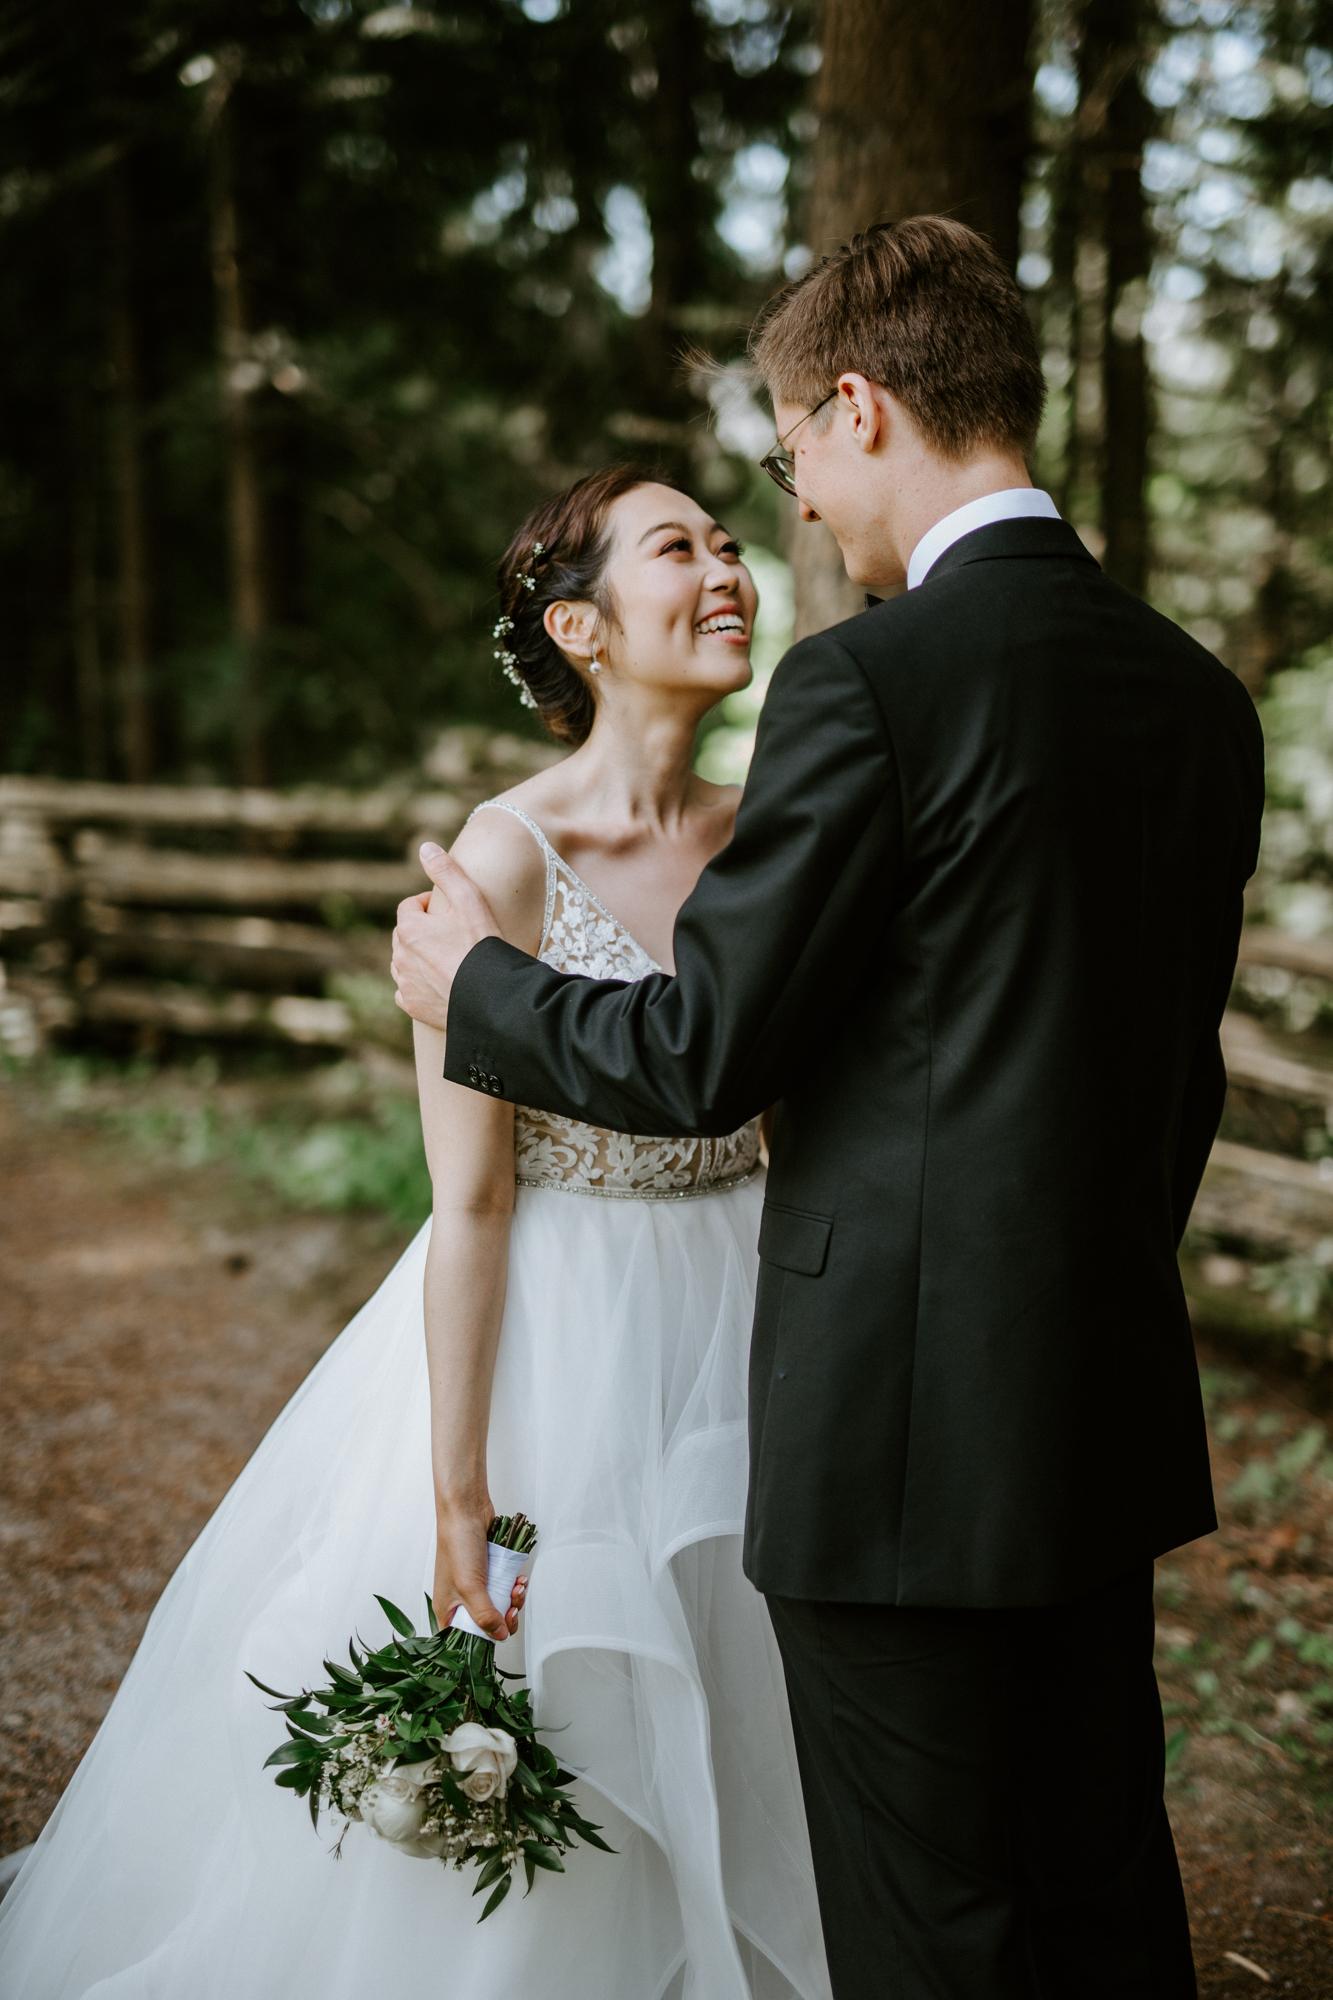 Yelim& Sorin- Wedding Day- HL-SD-61.JPG